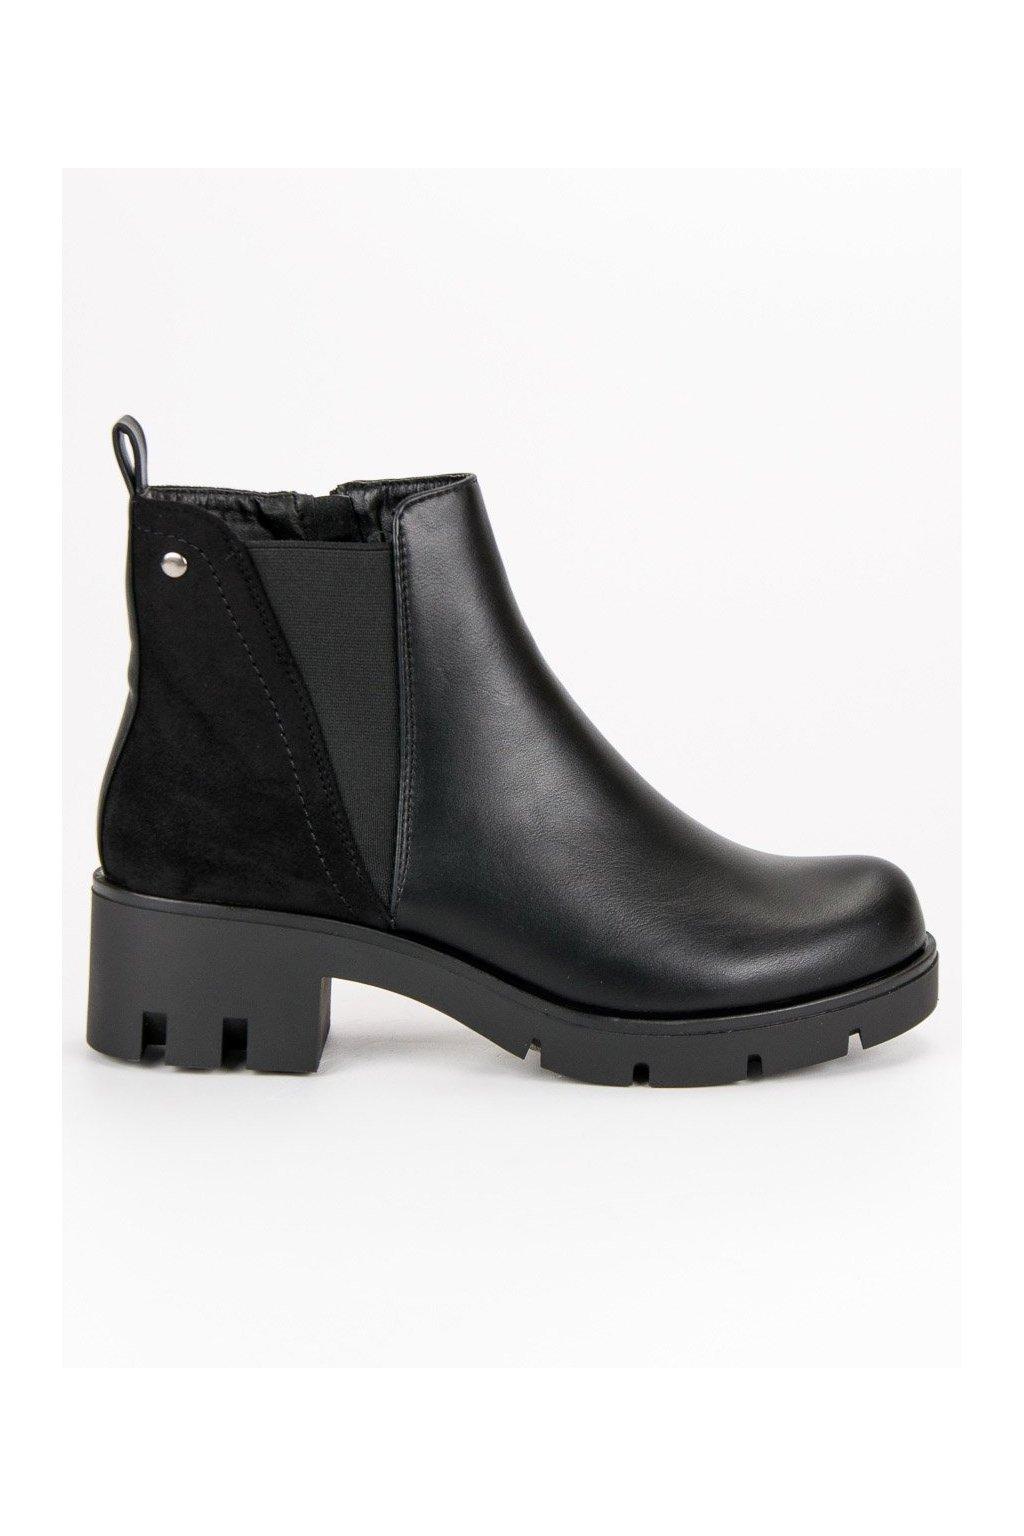 52c4b40720 1045458-1 pohodlne-cierne-topanky-lucky-shoes.jpg 5c0071c5